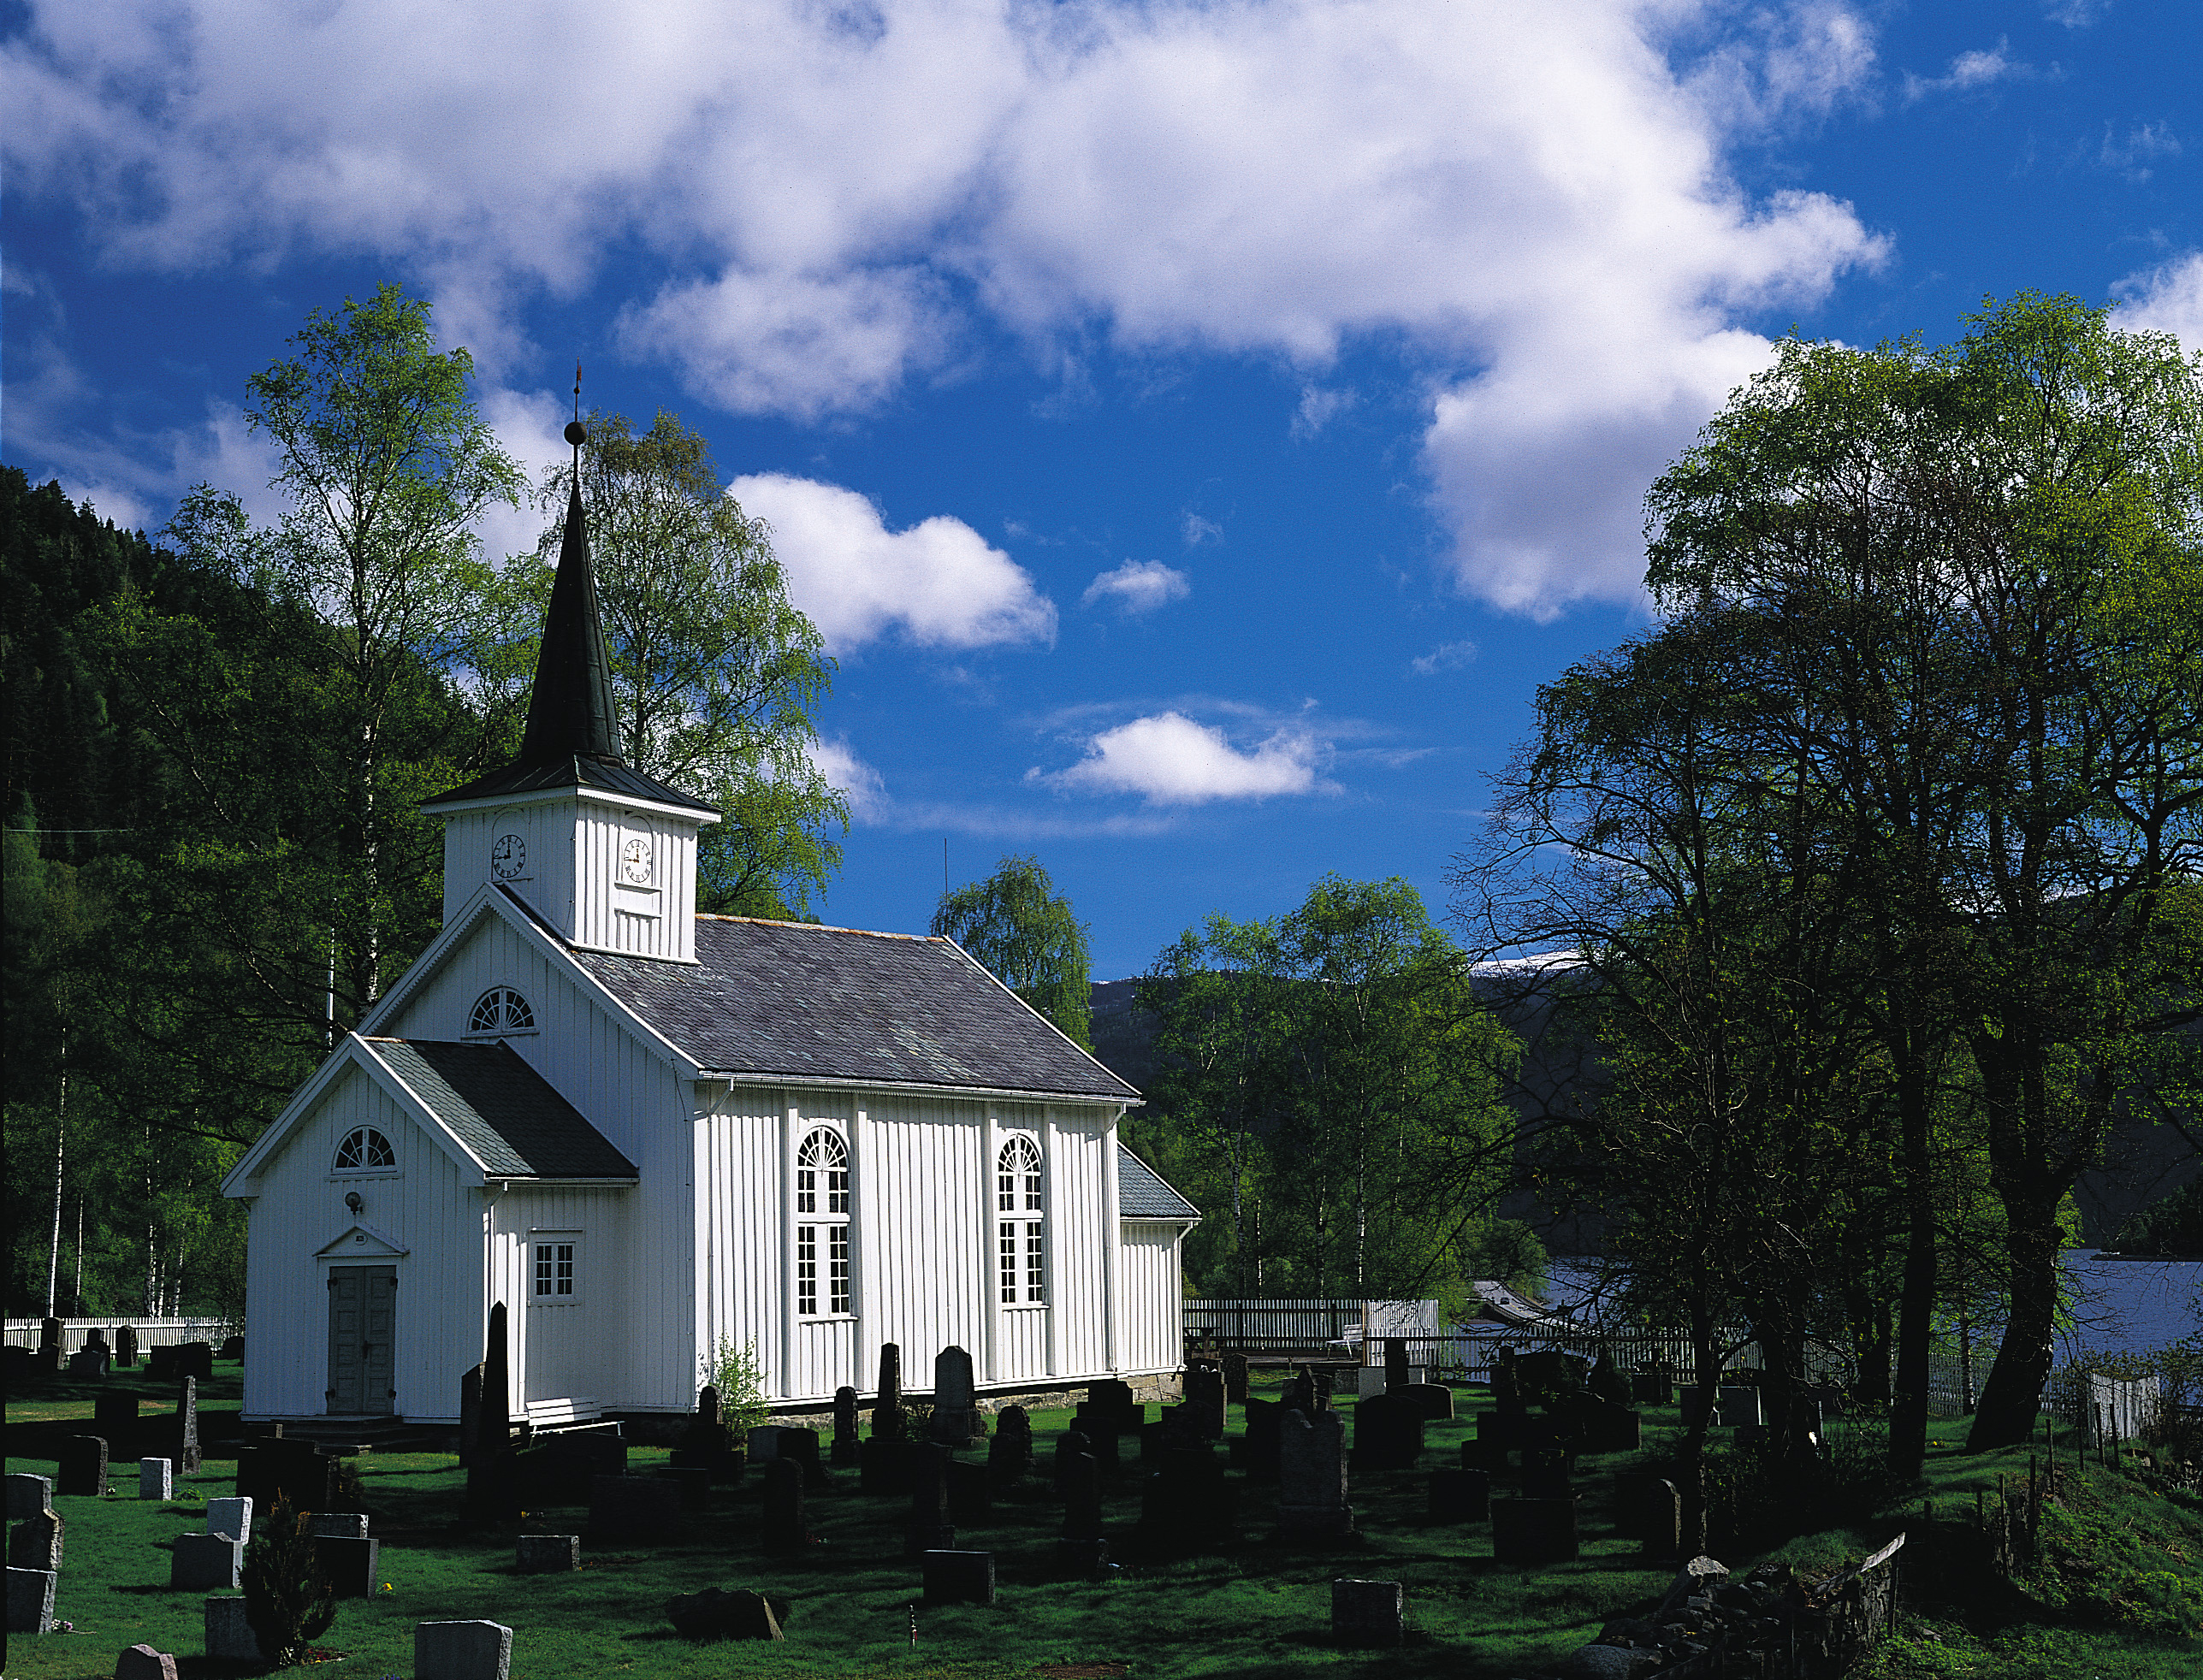 Mæl kirke er en langkirke i tre fra 1839. Kirken er tegnet av Hans Ditlev Frank Linstow. Copyright:Ove Bergersen, © Ove Bergersen